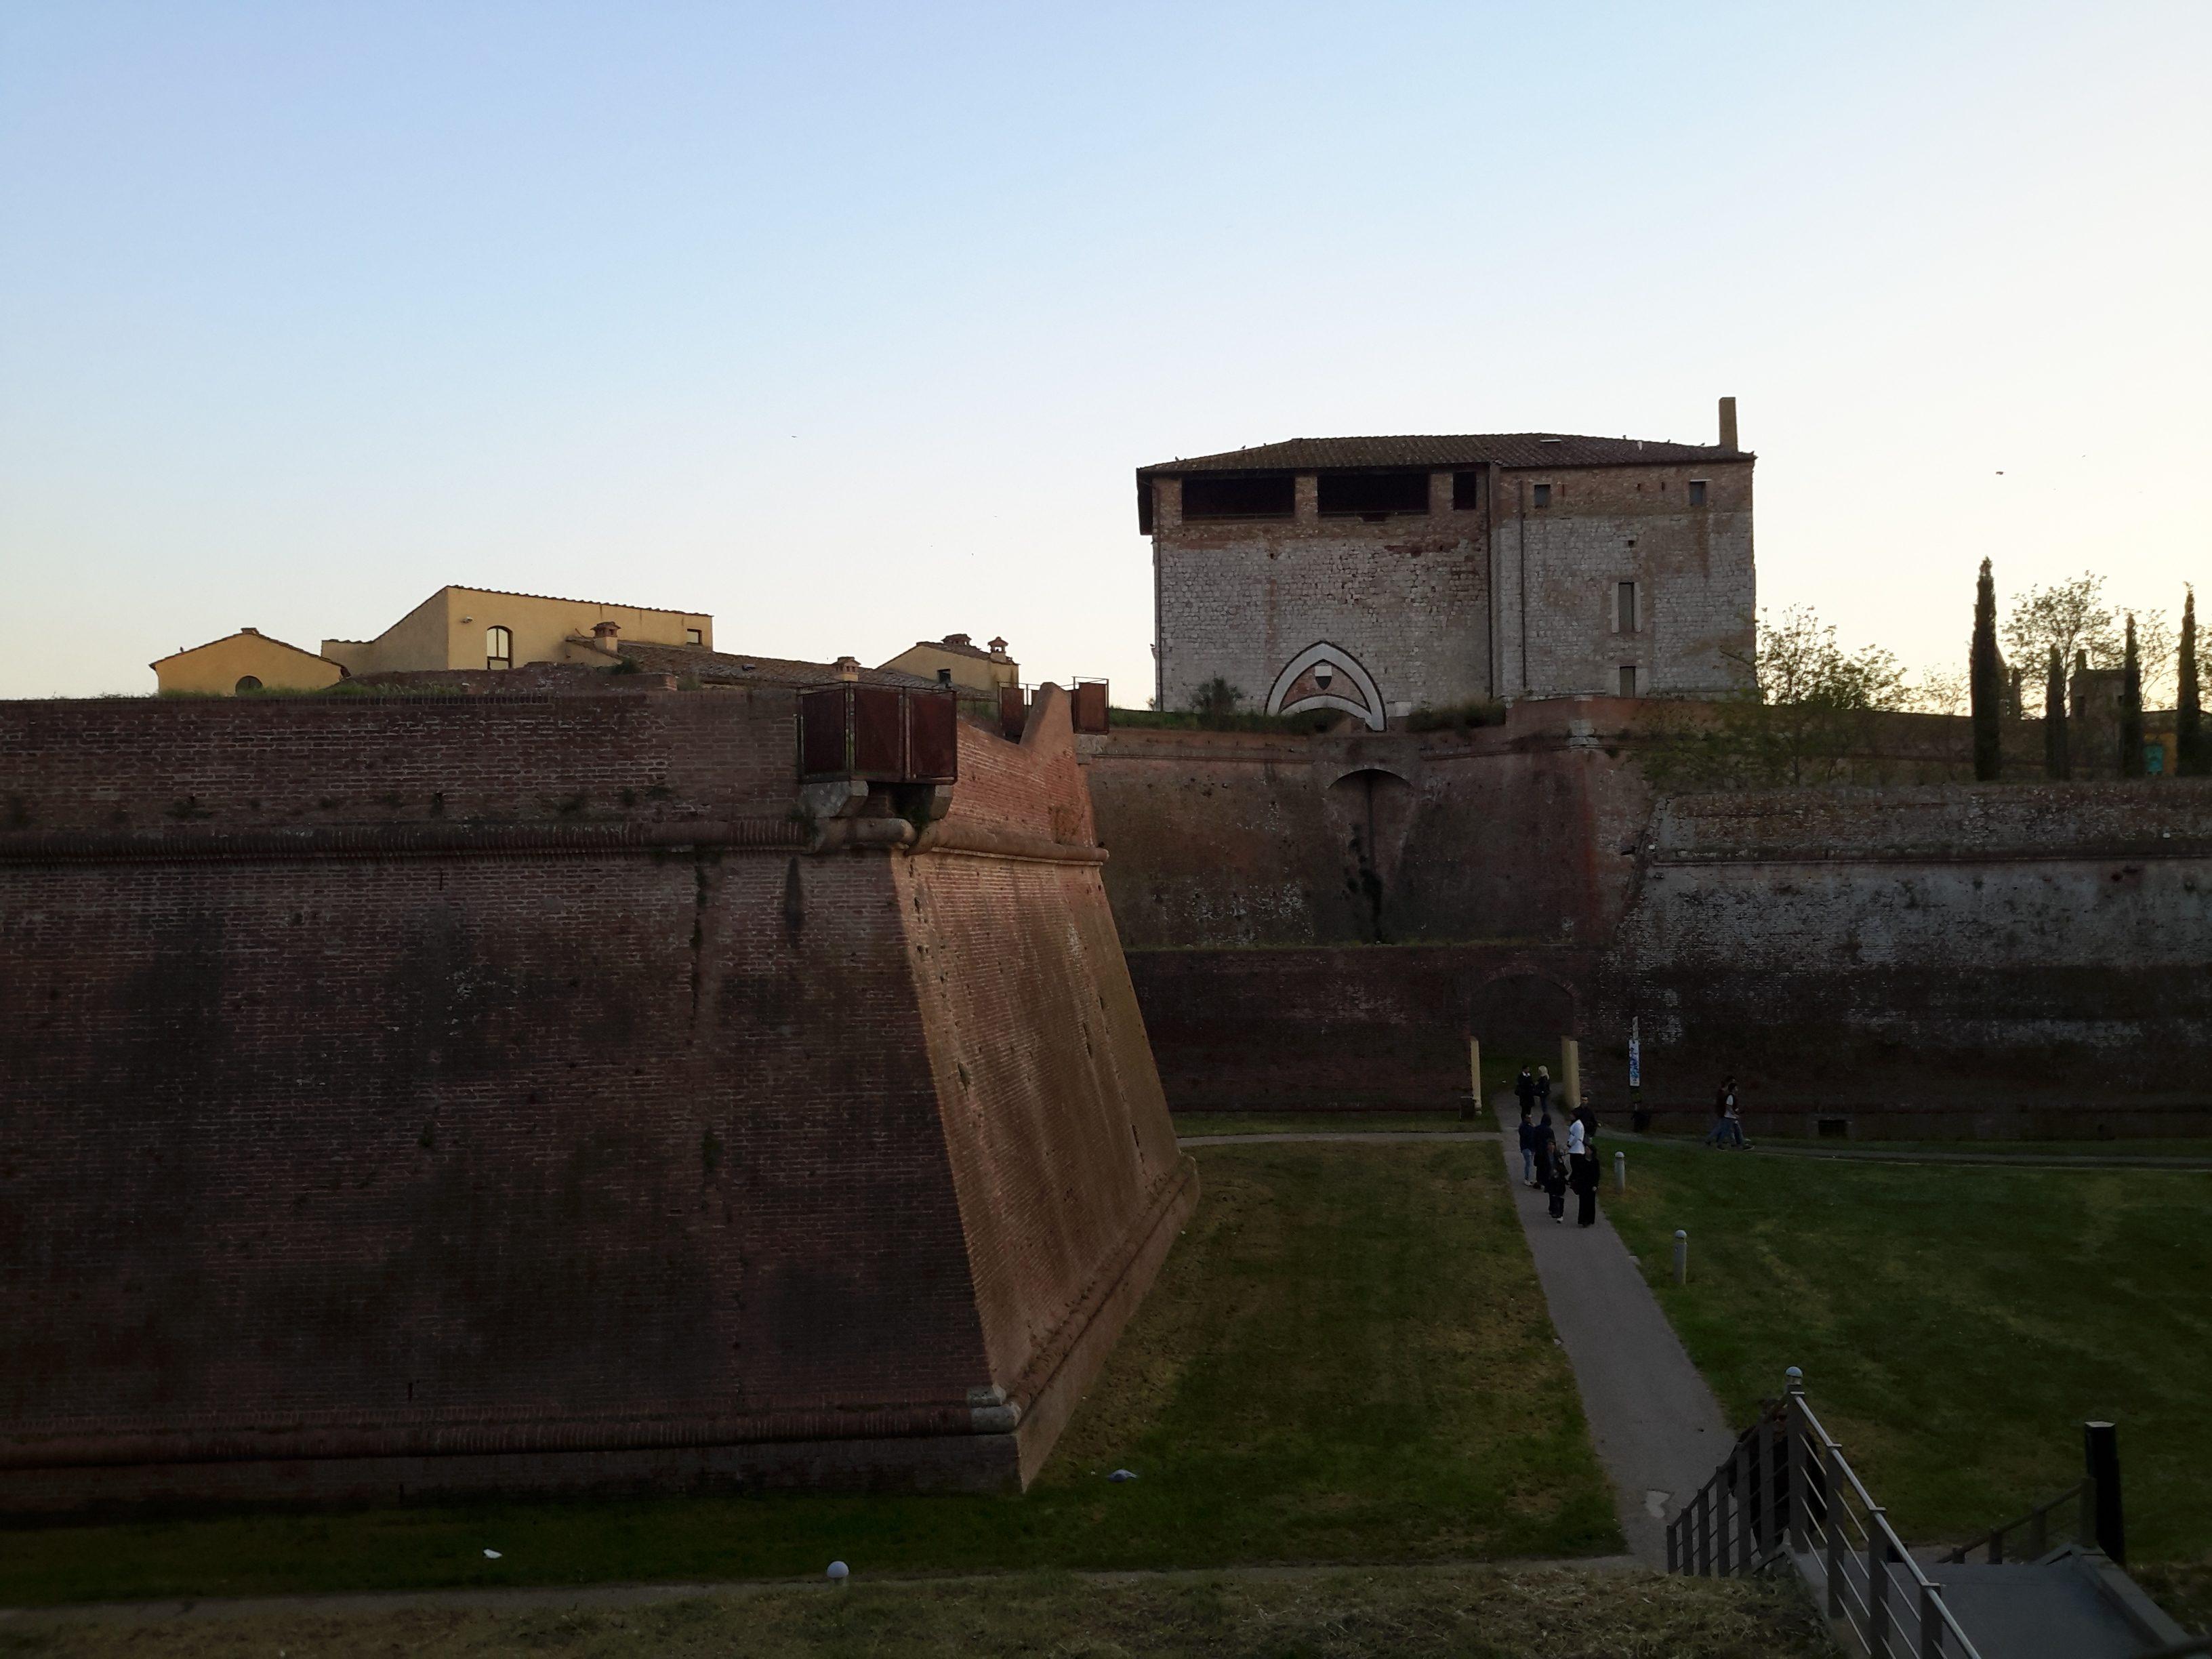 Mura Medicee e Cassero Senese Grosseto GetCOO travel